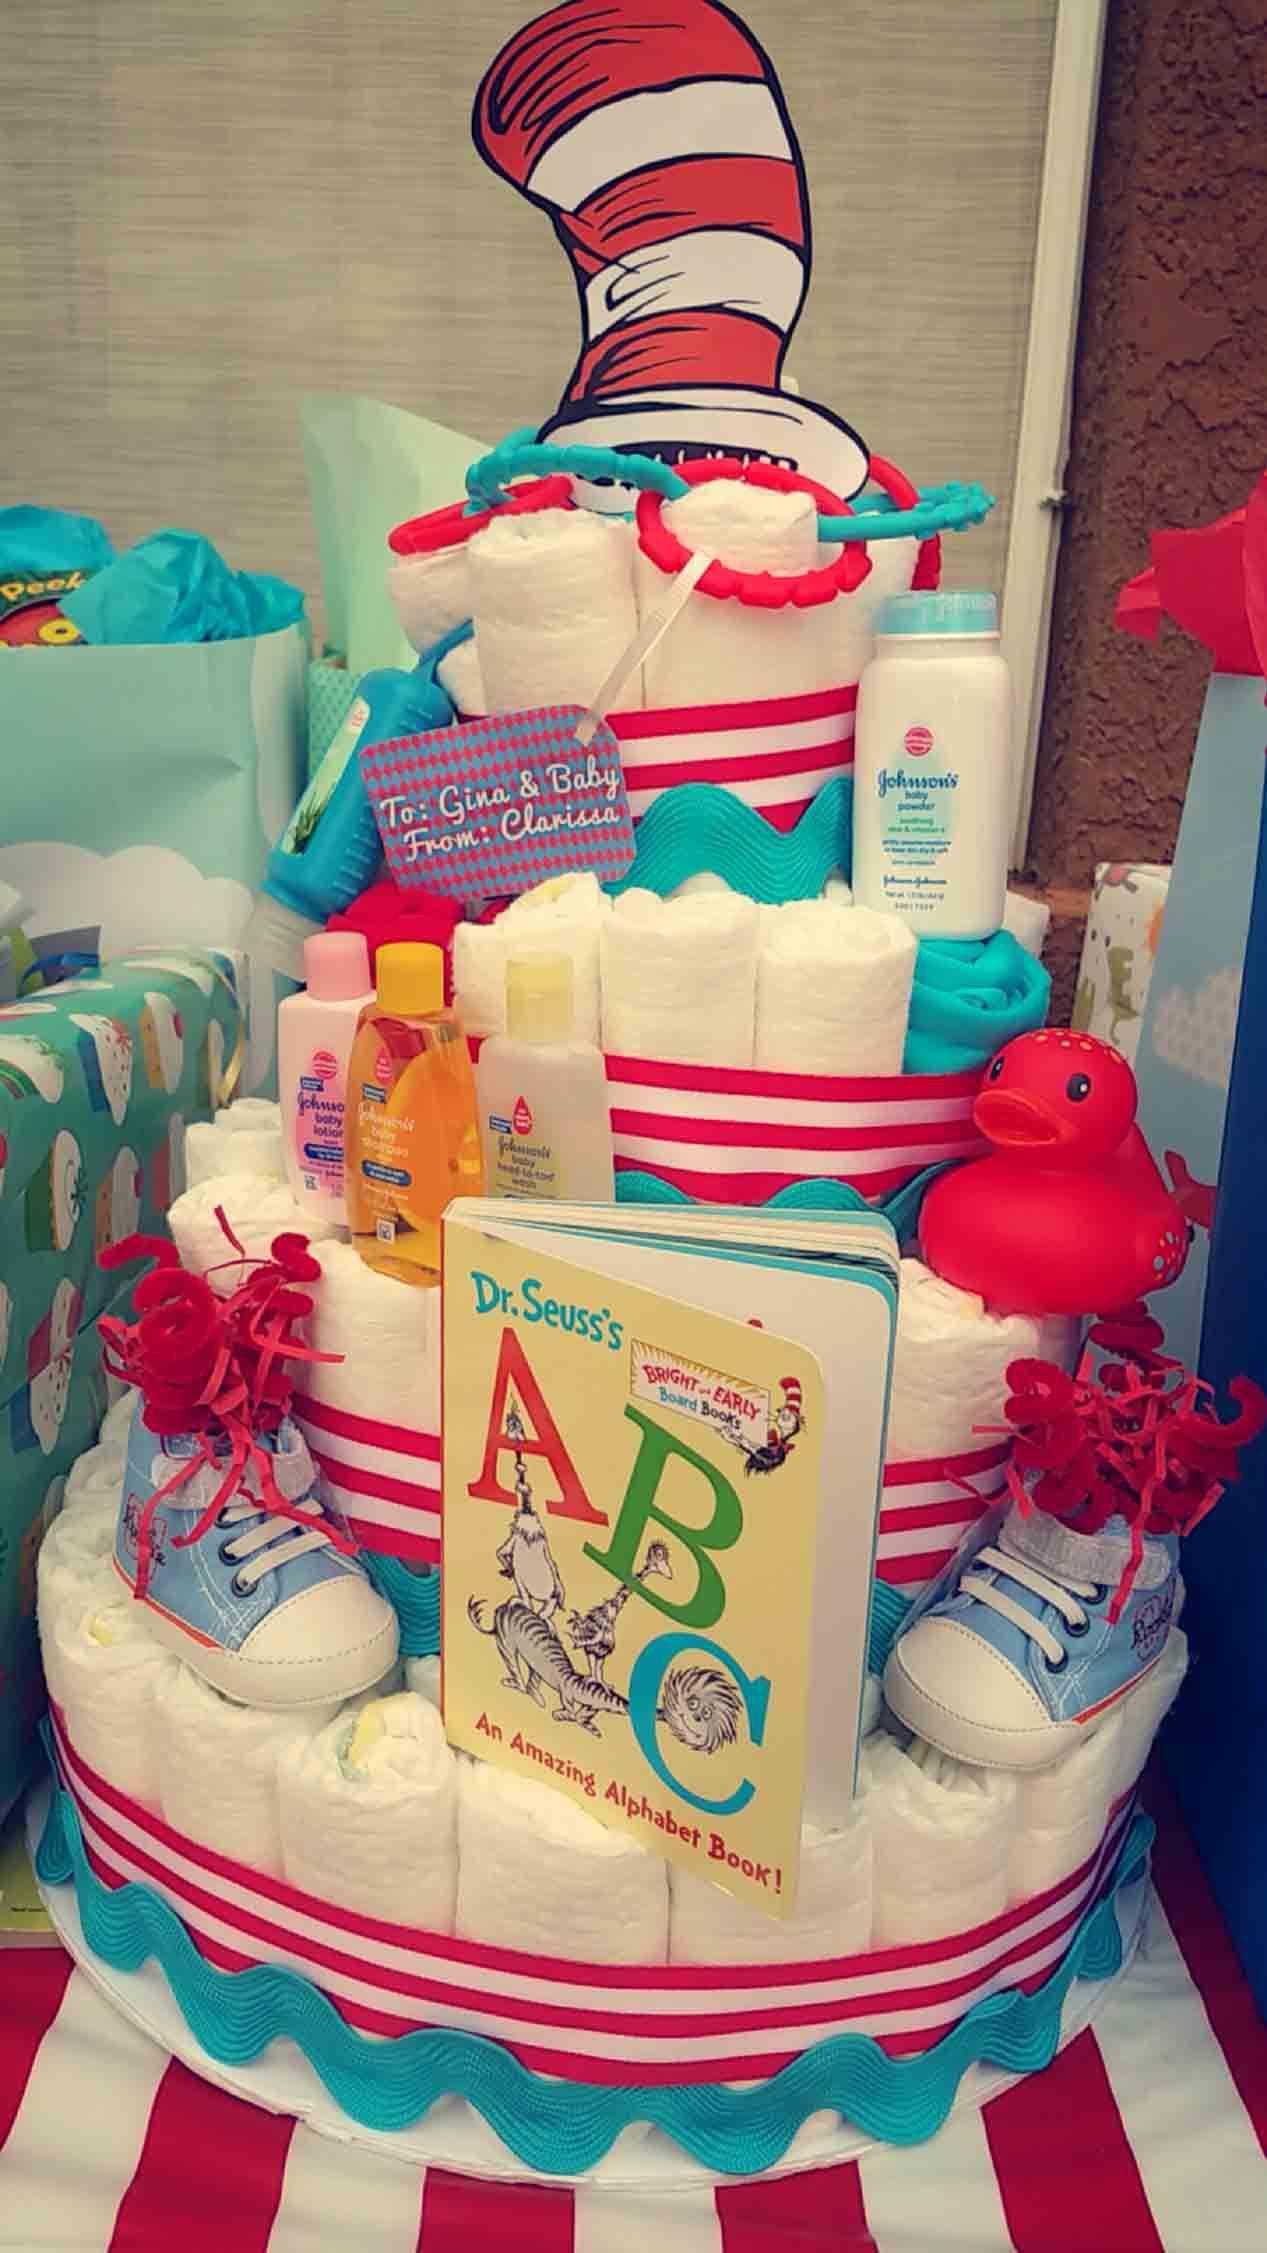 How to Make a Diaper Cake WIth a Dr Seuss Theme